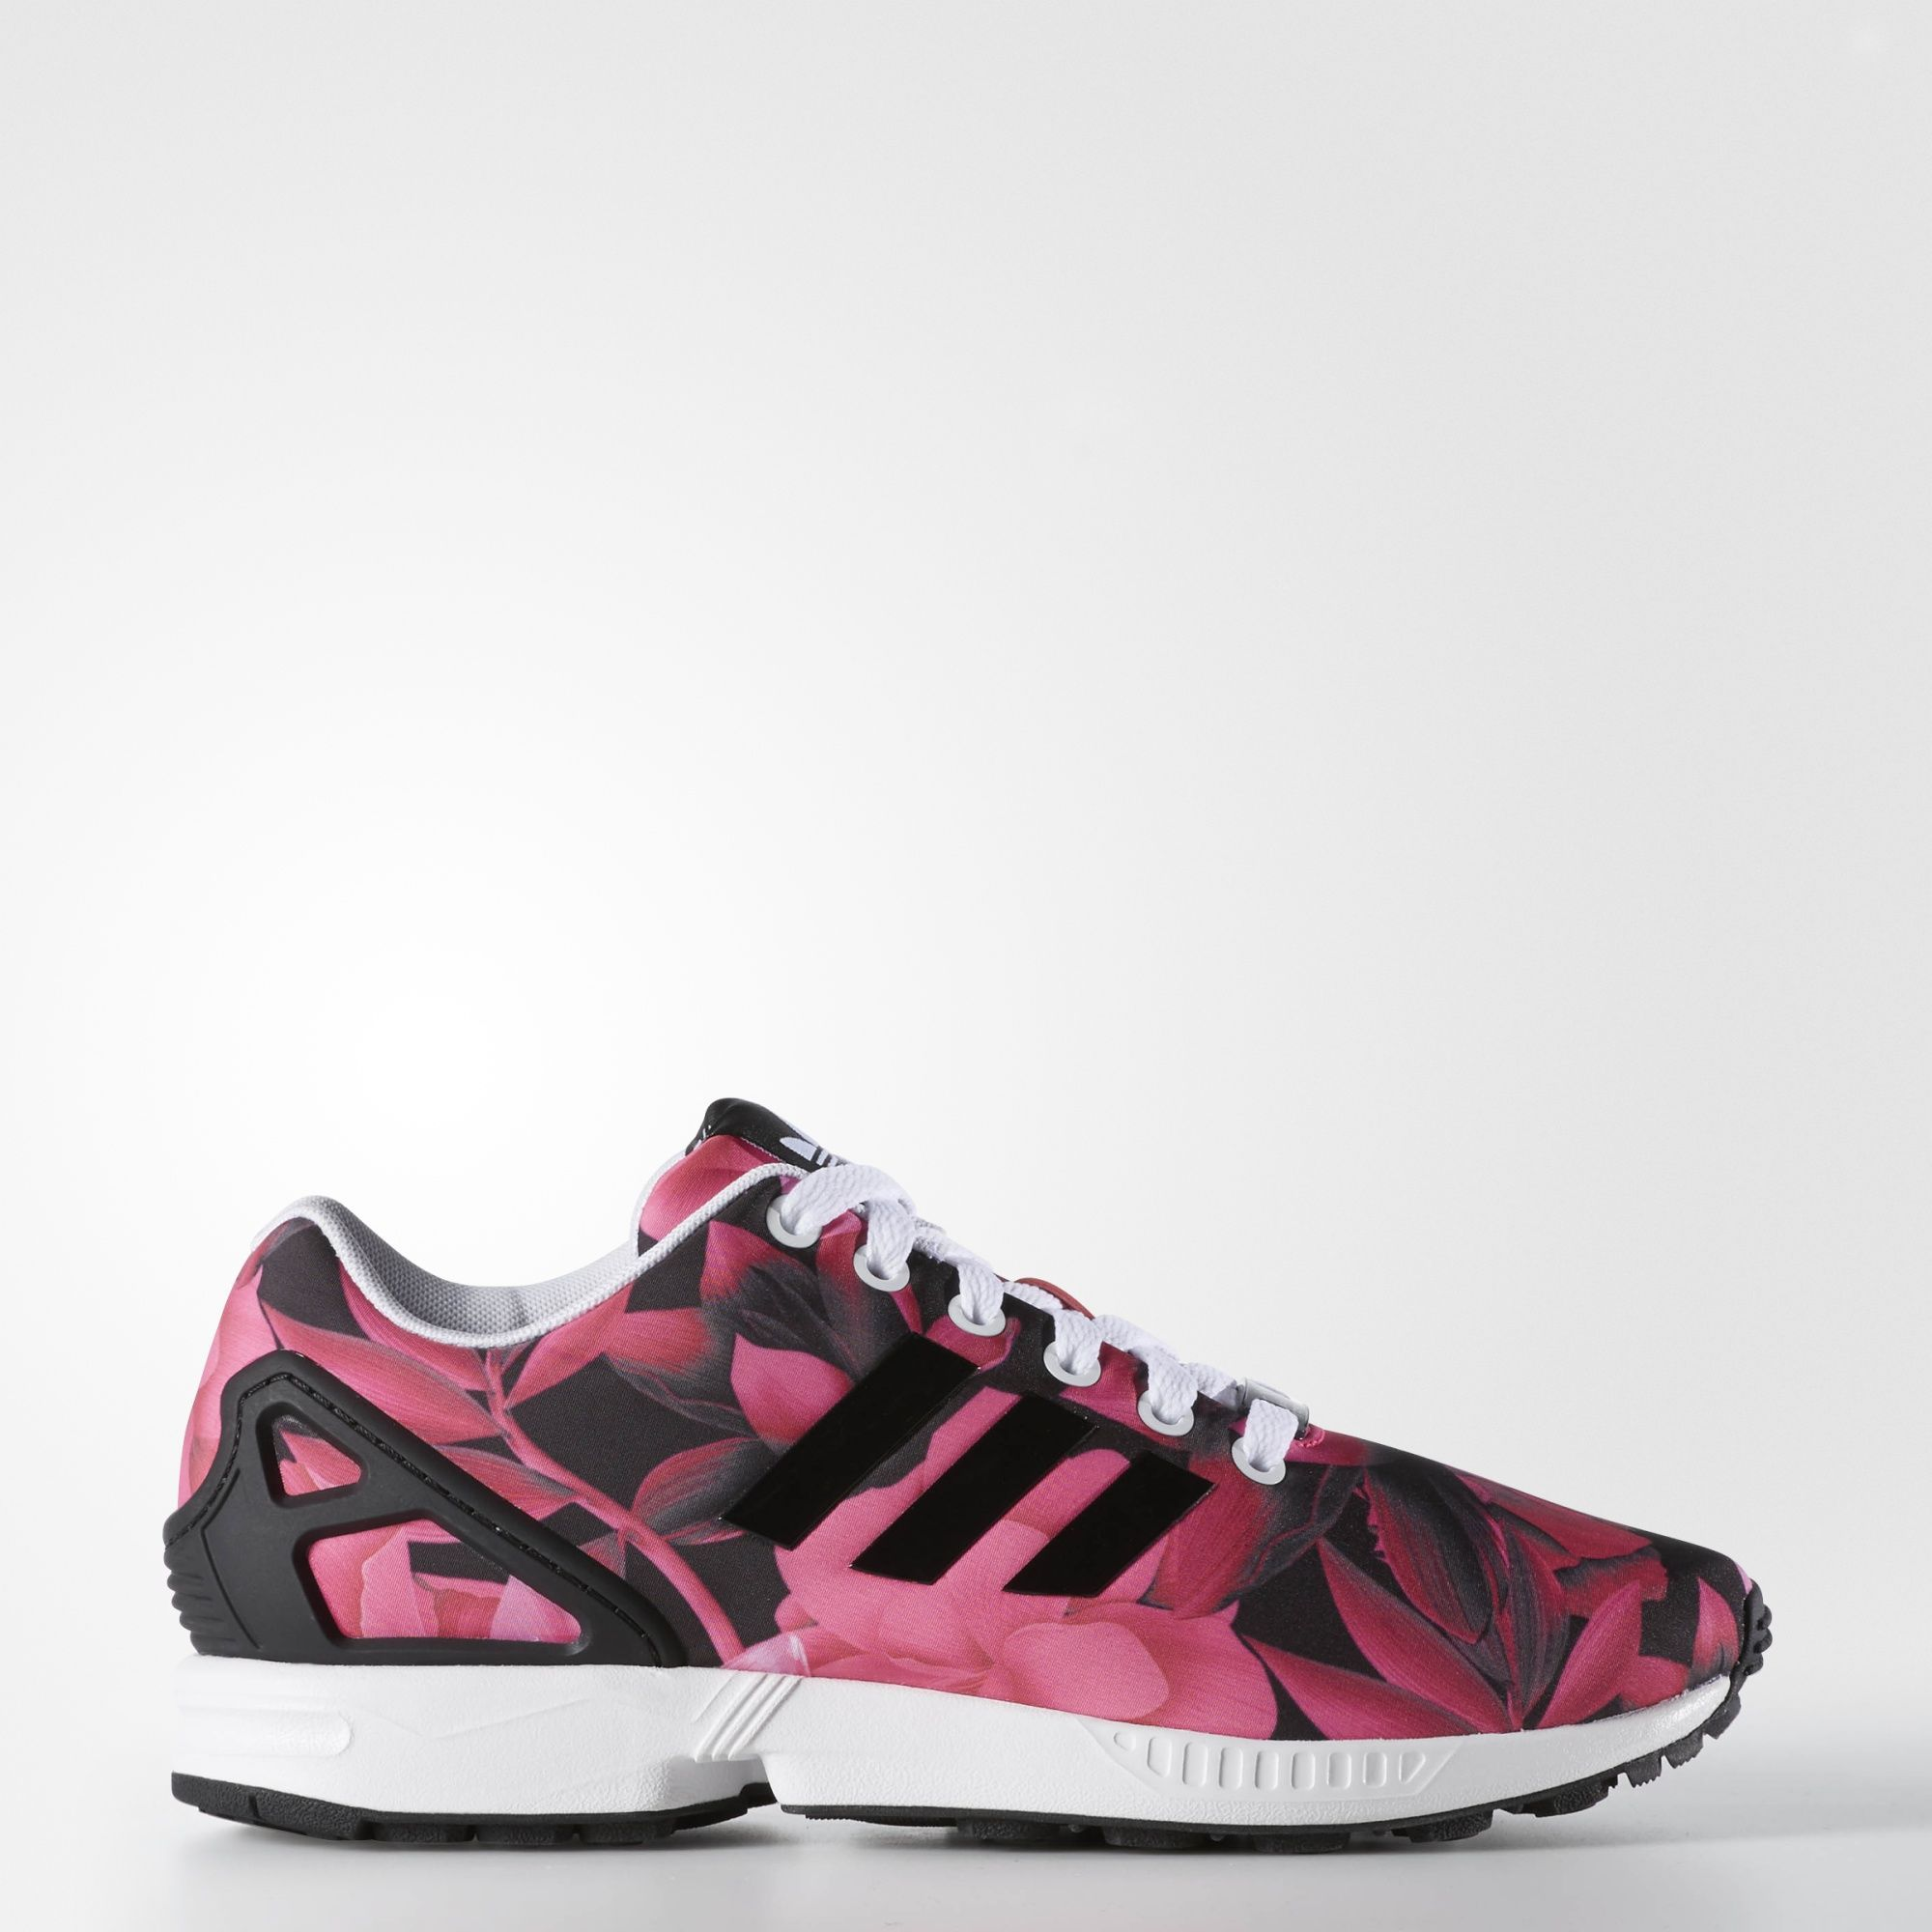 adidas zx flusso le scarpe adidas zx flusso scarpe pinterest